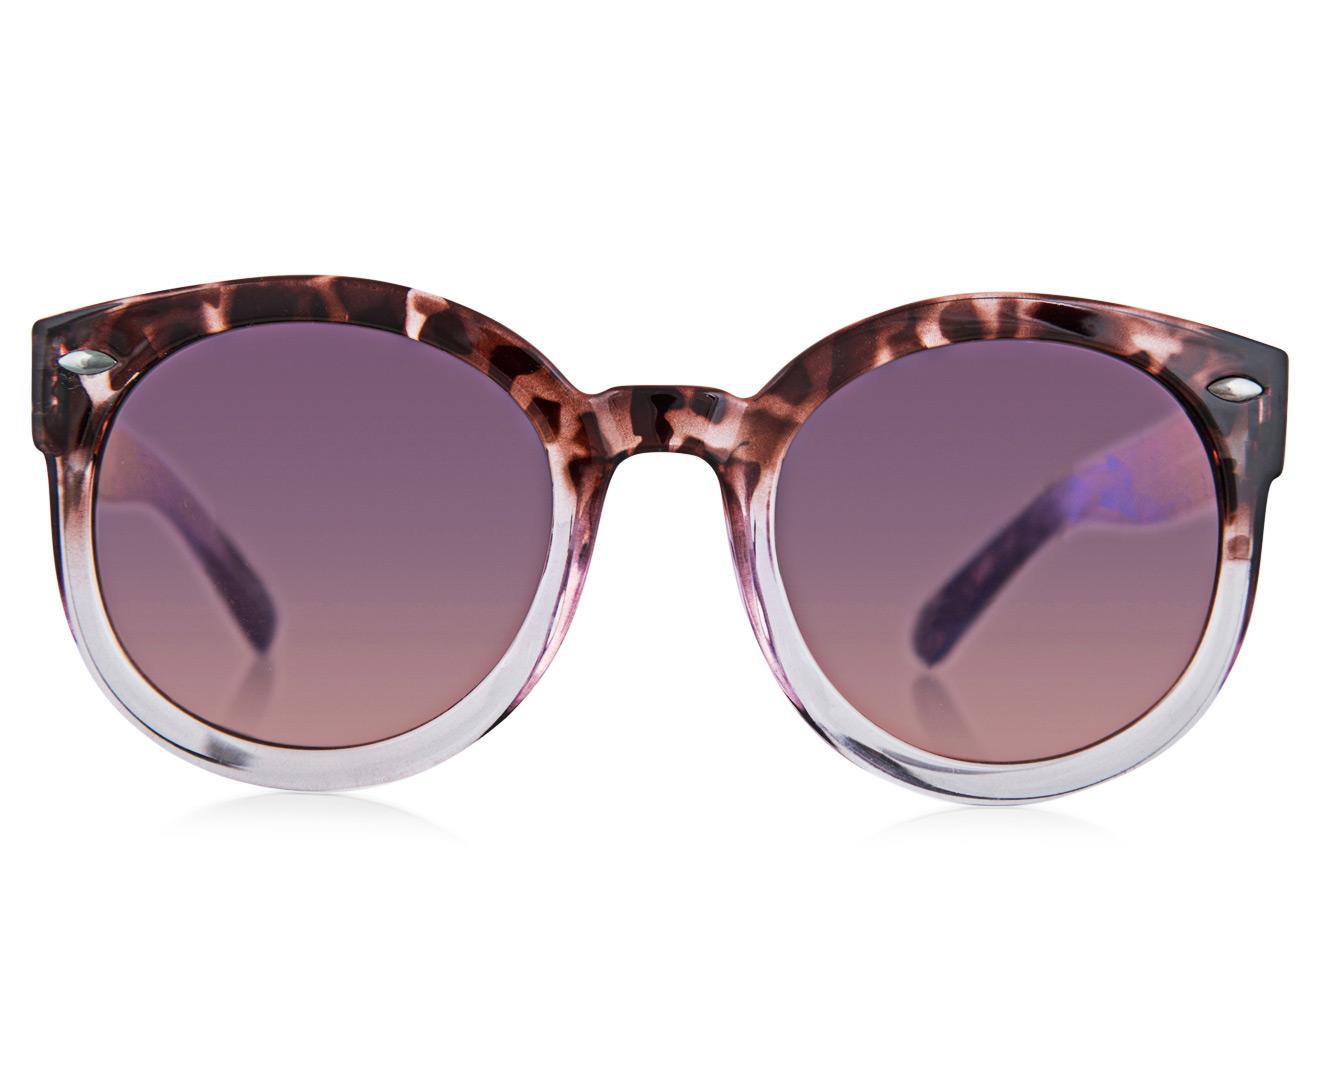 Dot Dash Women's Pool Party Sunglasses